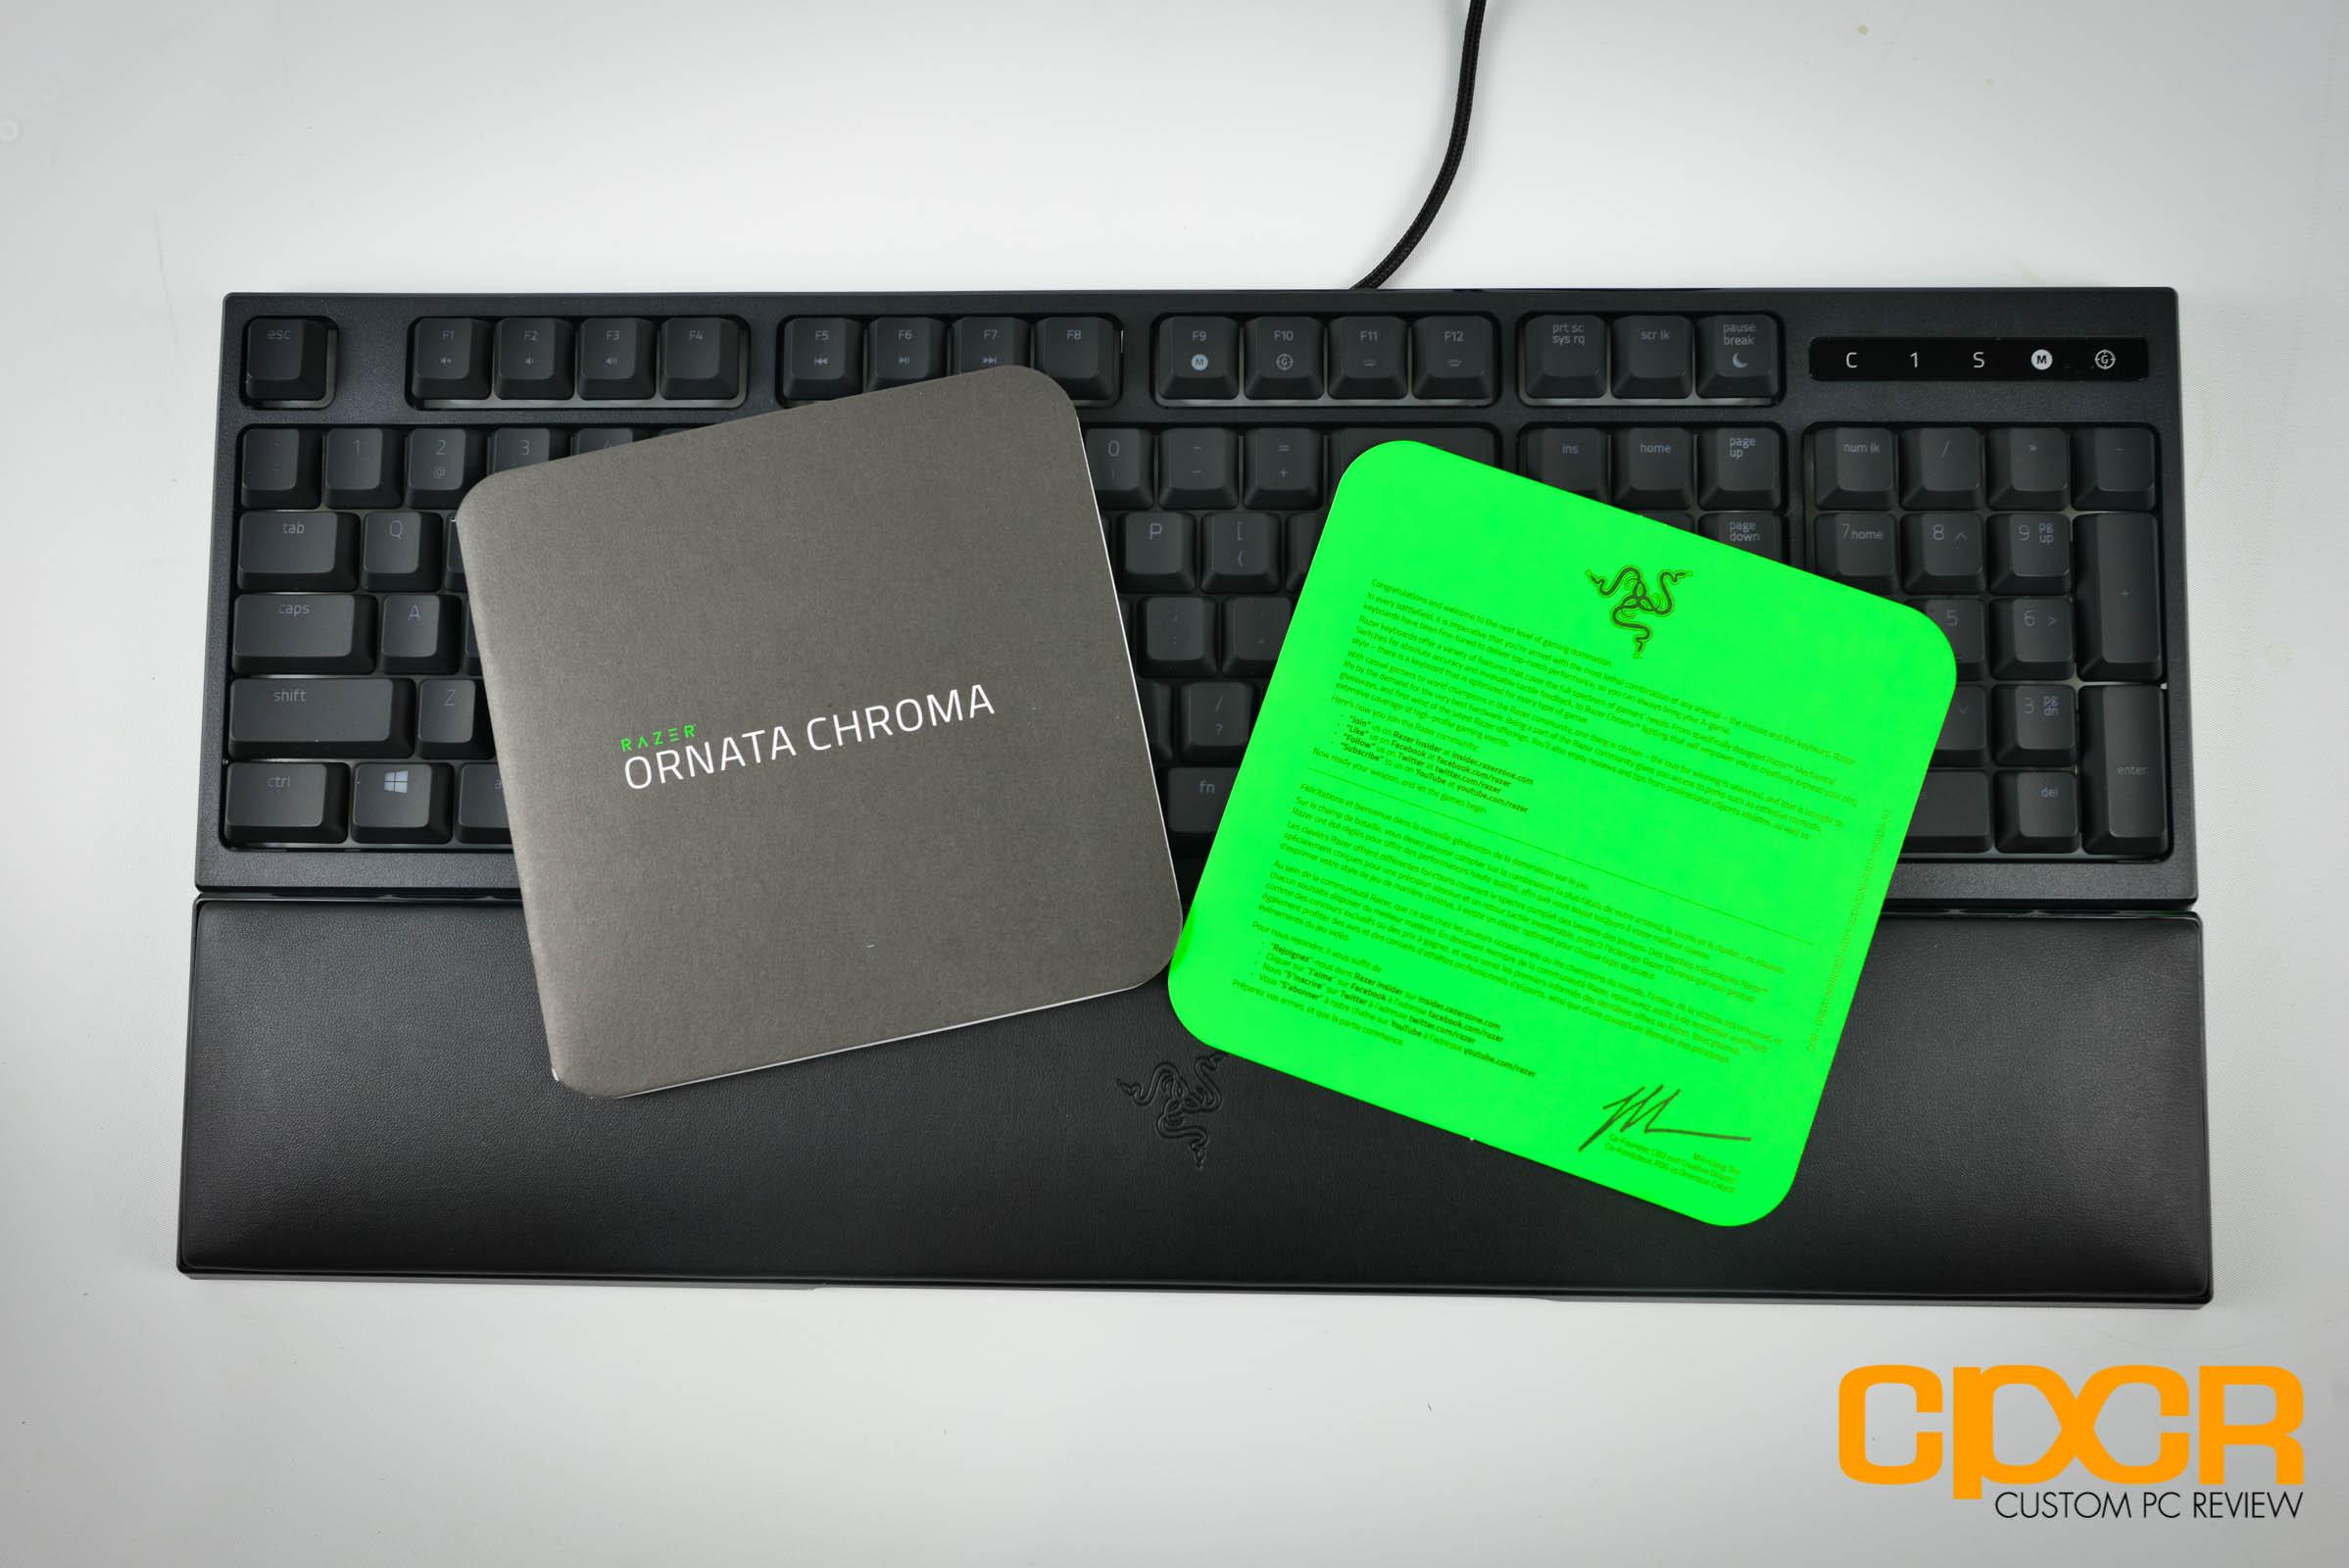 razer chroma ornata how to clean keyboard